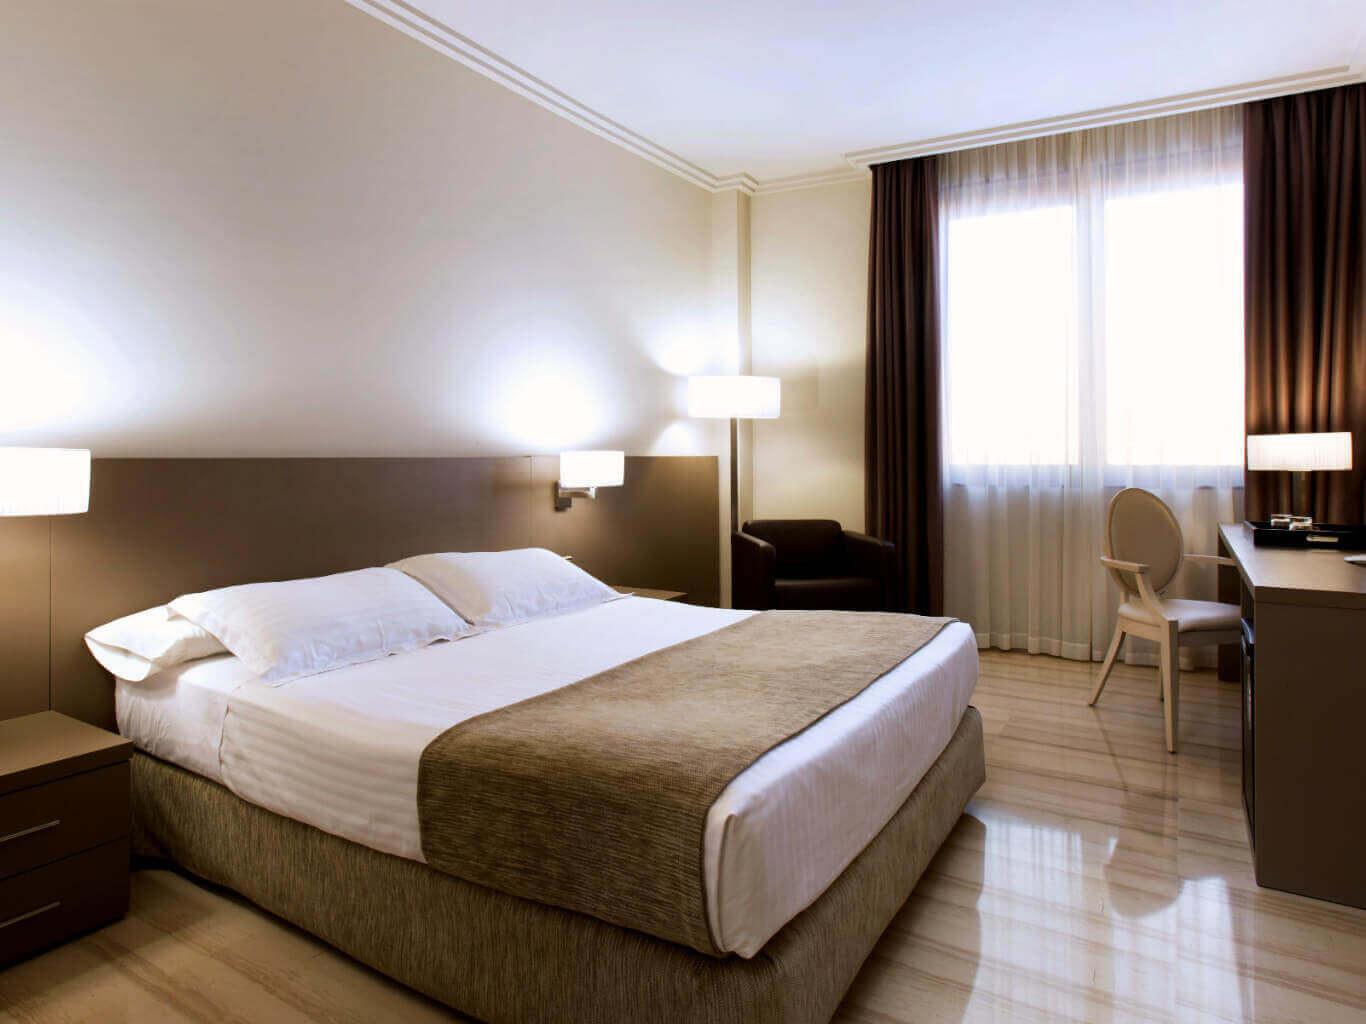 Habitaci n doble hotel ciutat de tarragona tarragona for Habitacion doble